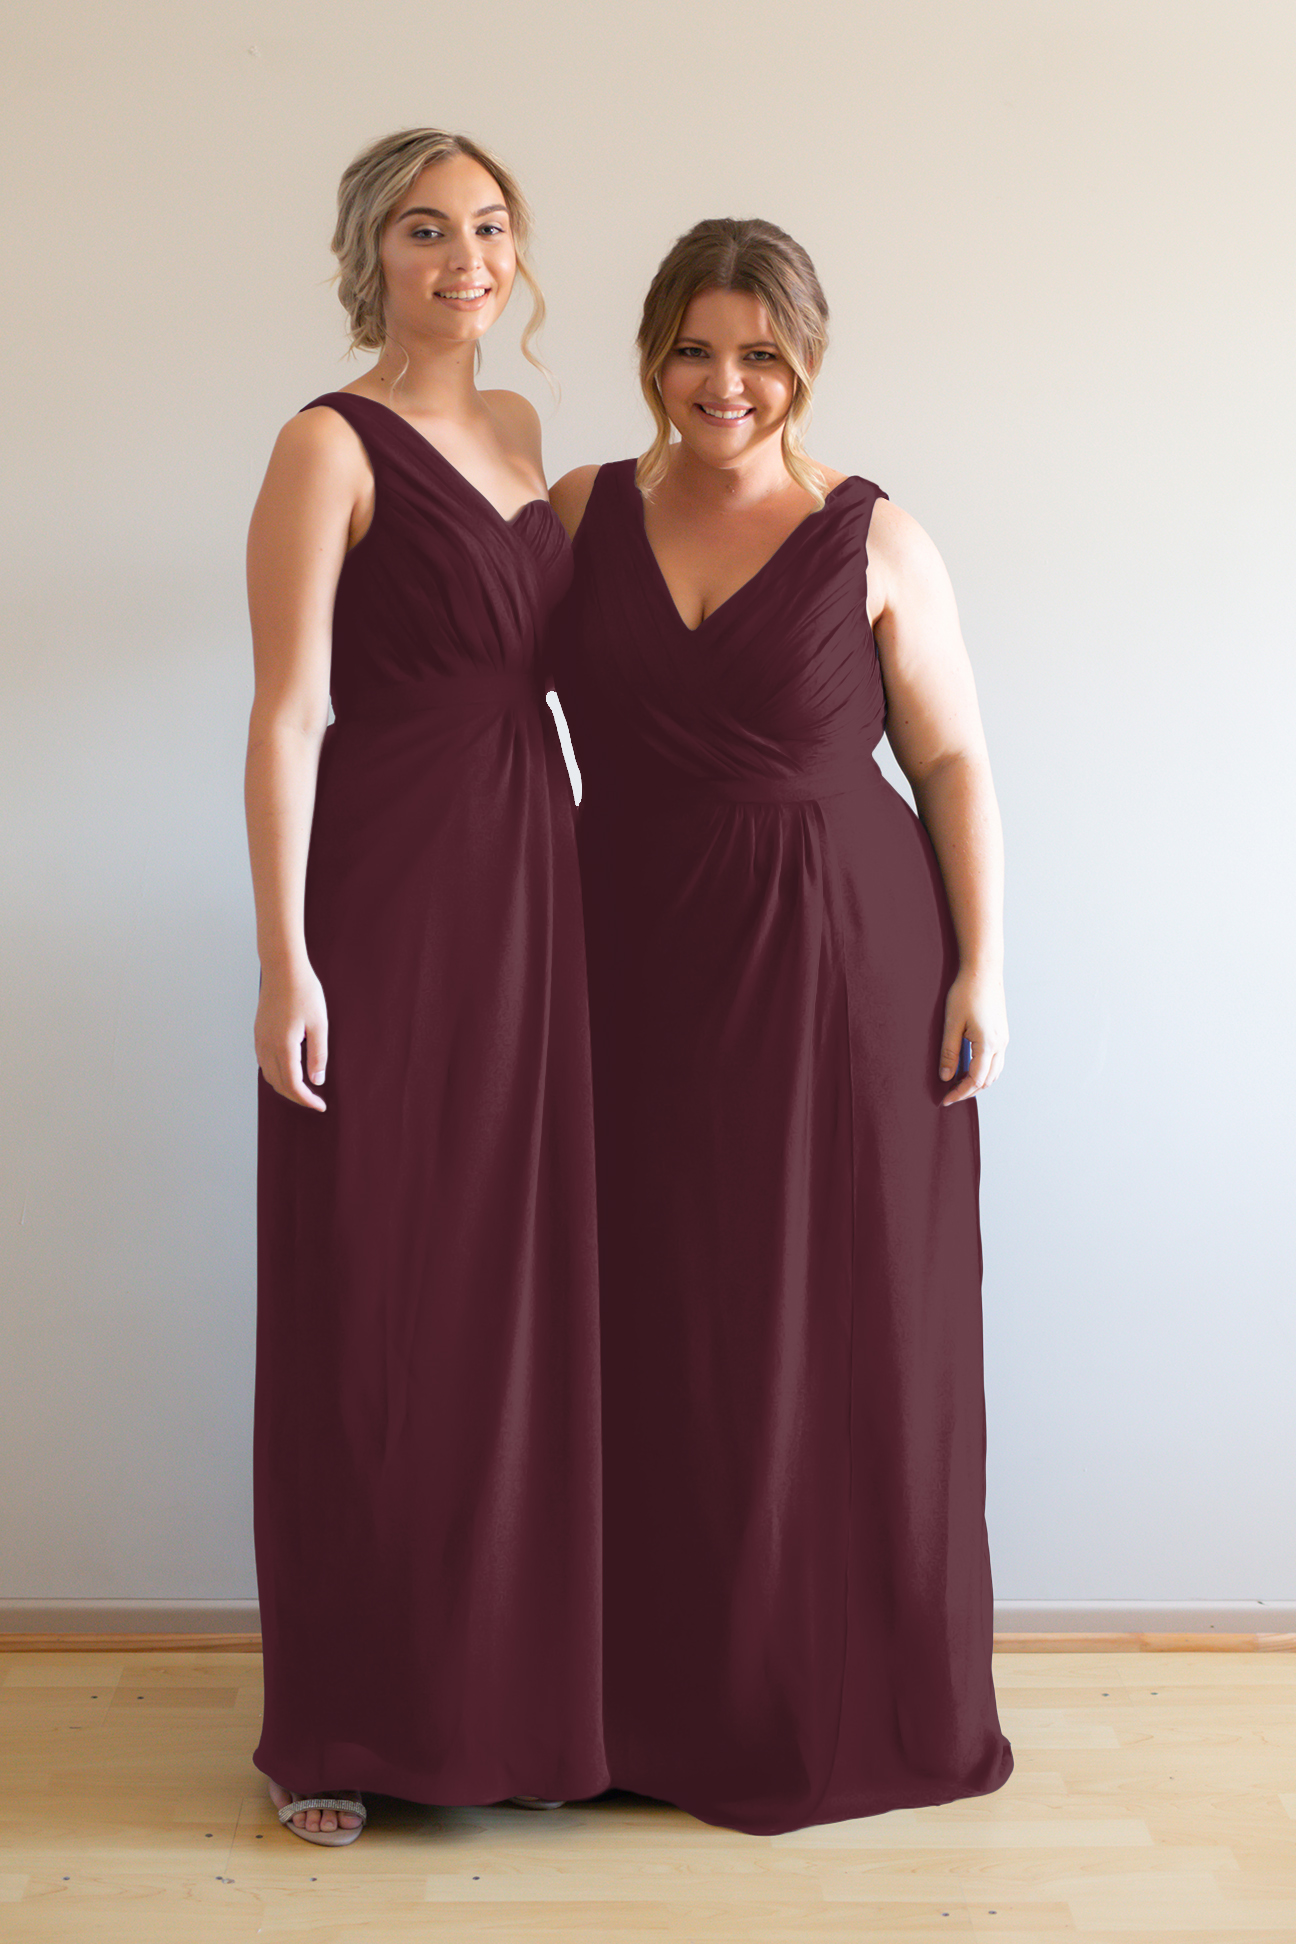 Millie Bridesmaids Dress by Talia Sarah in Mahogany